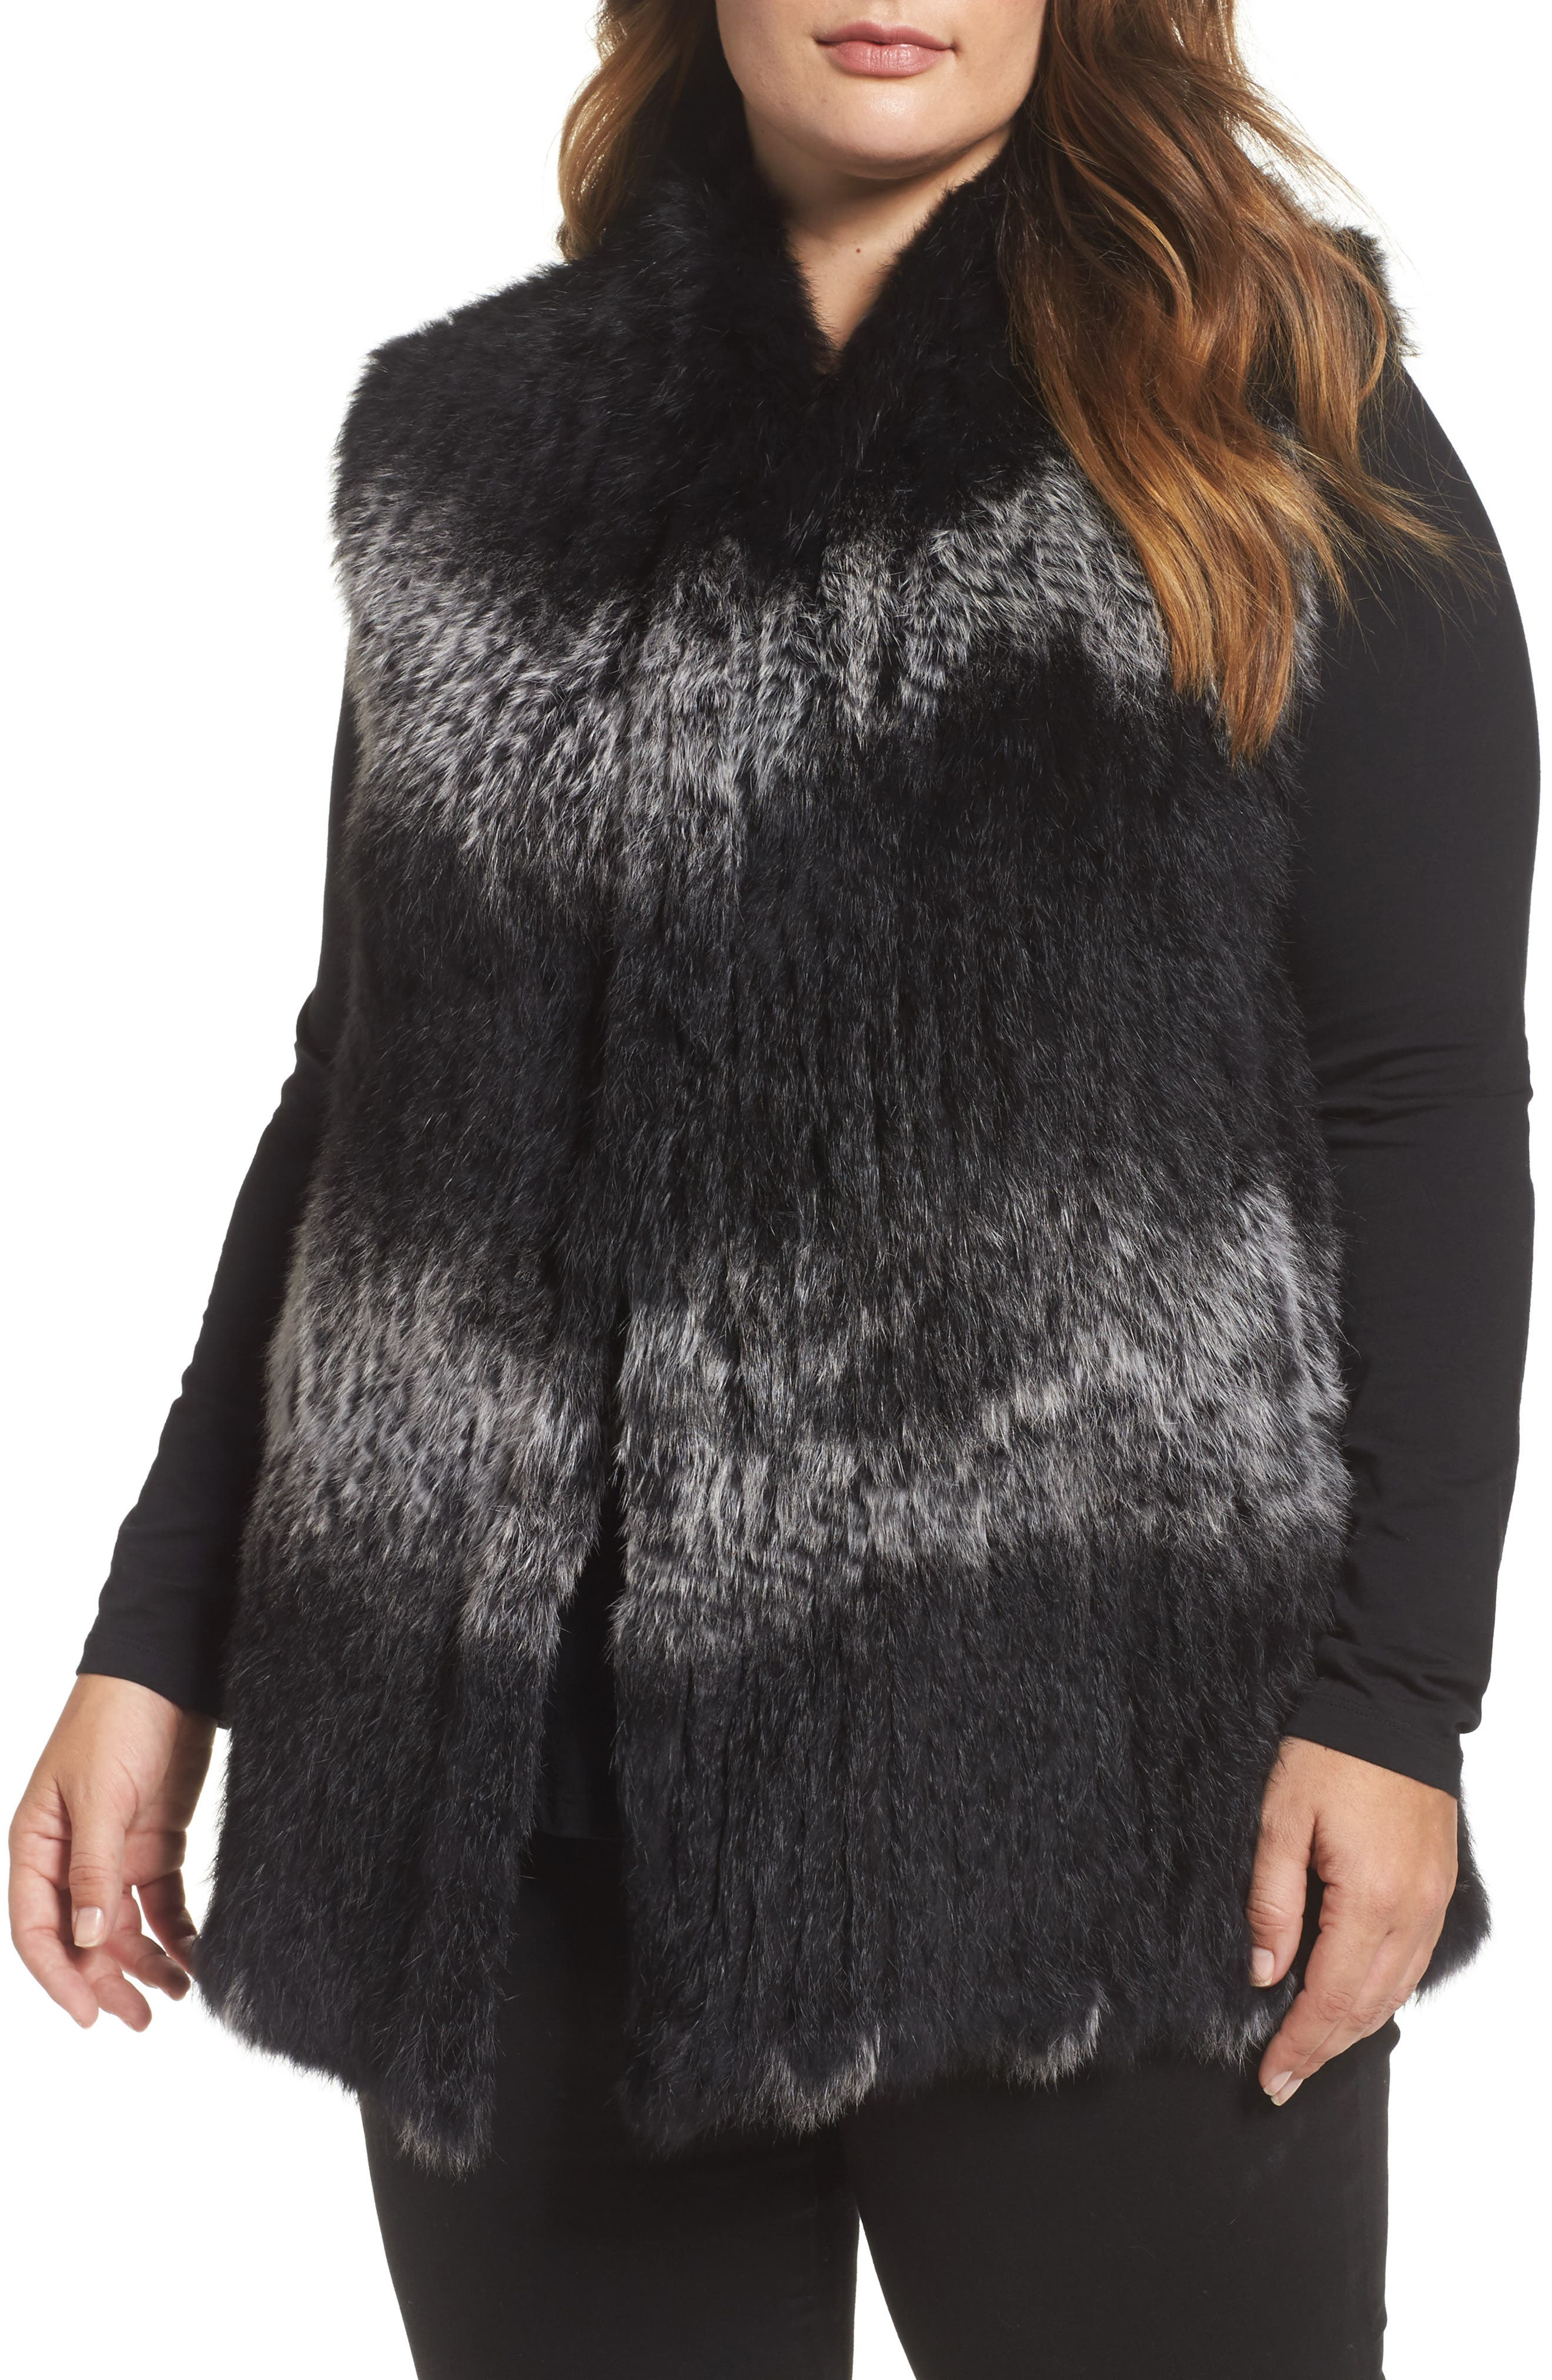 Main Image - Love Token Genuine Rabbit Fur Vest (Plus Size)